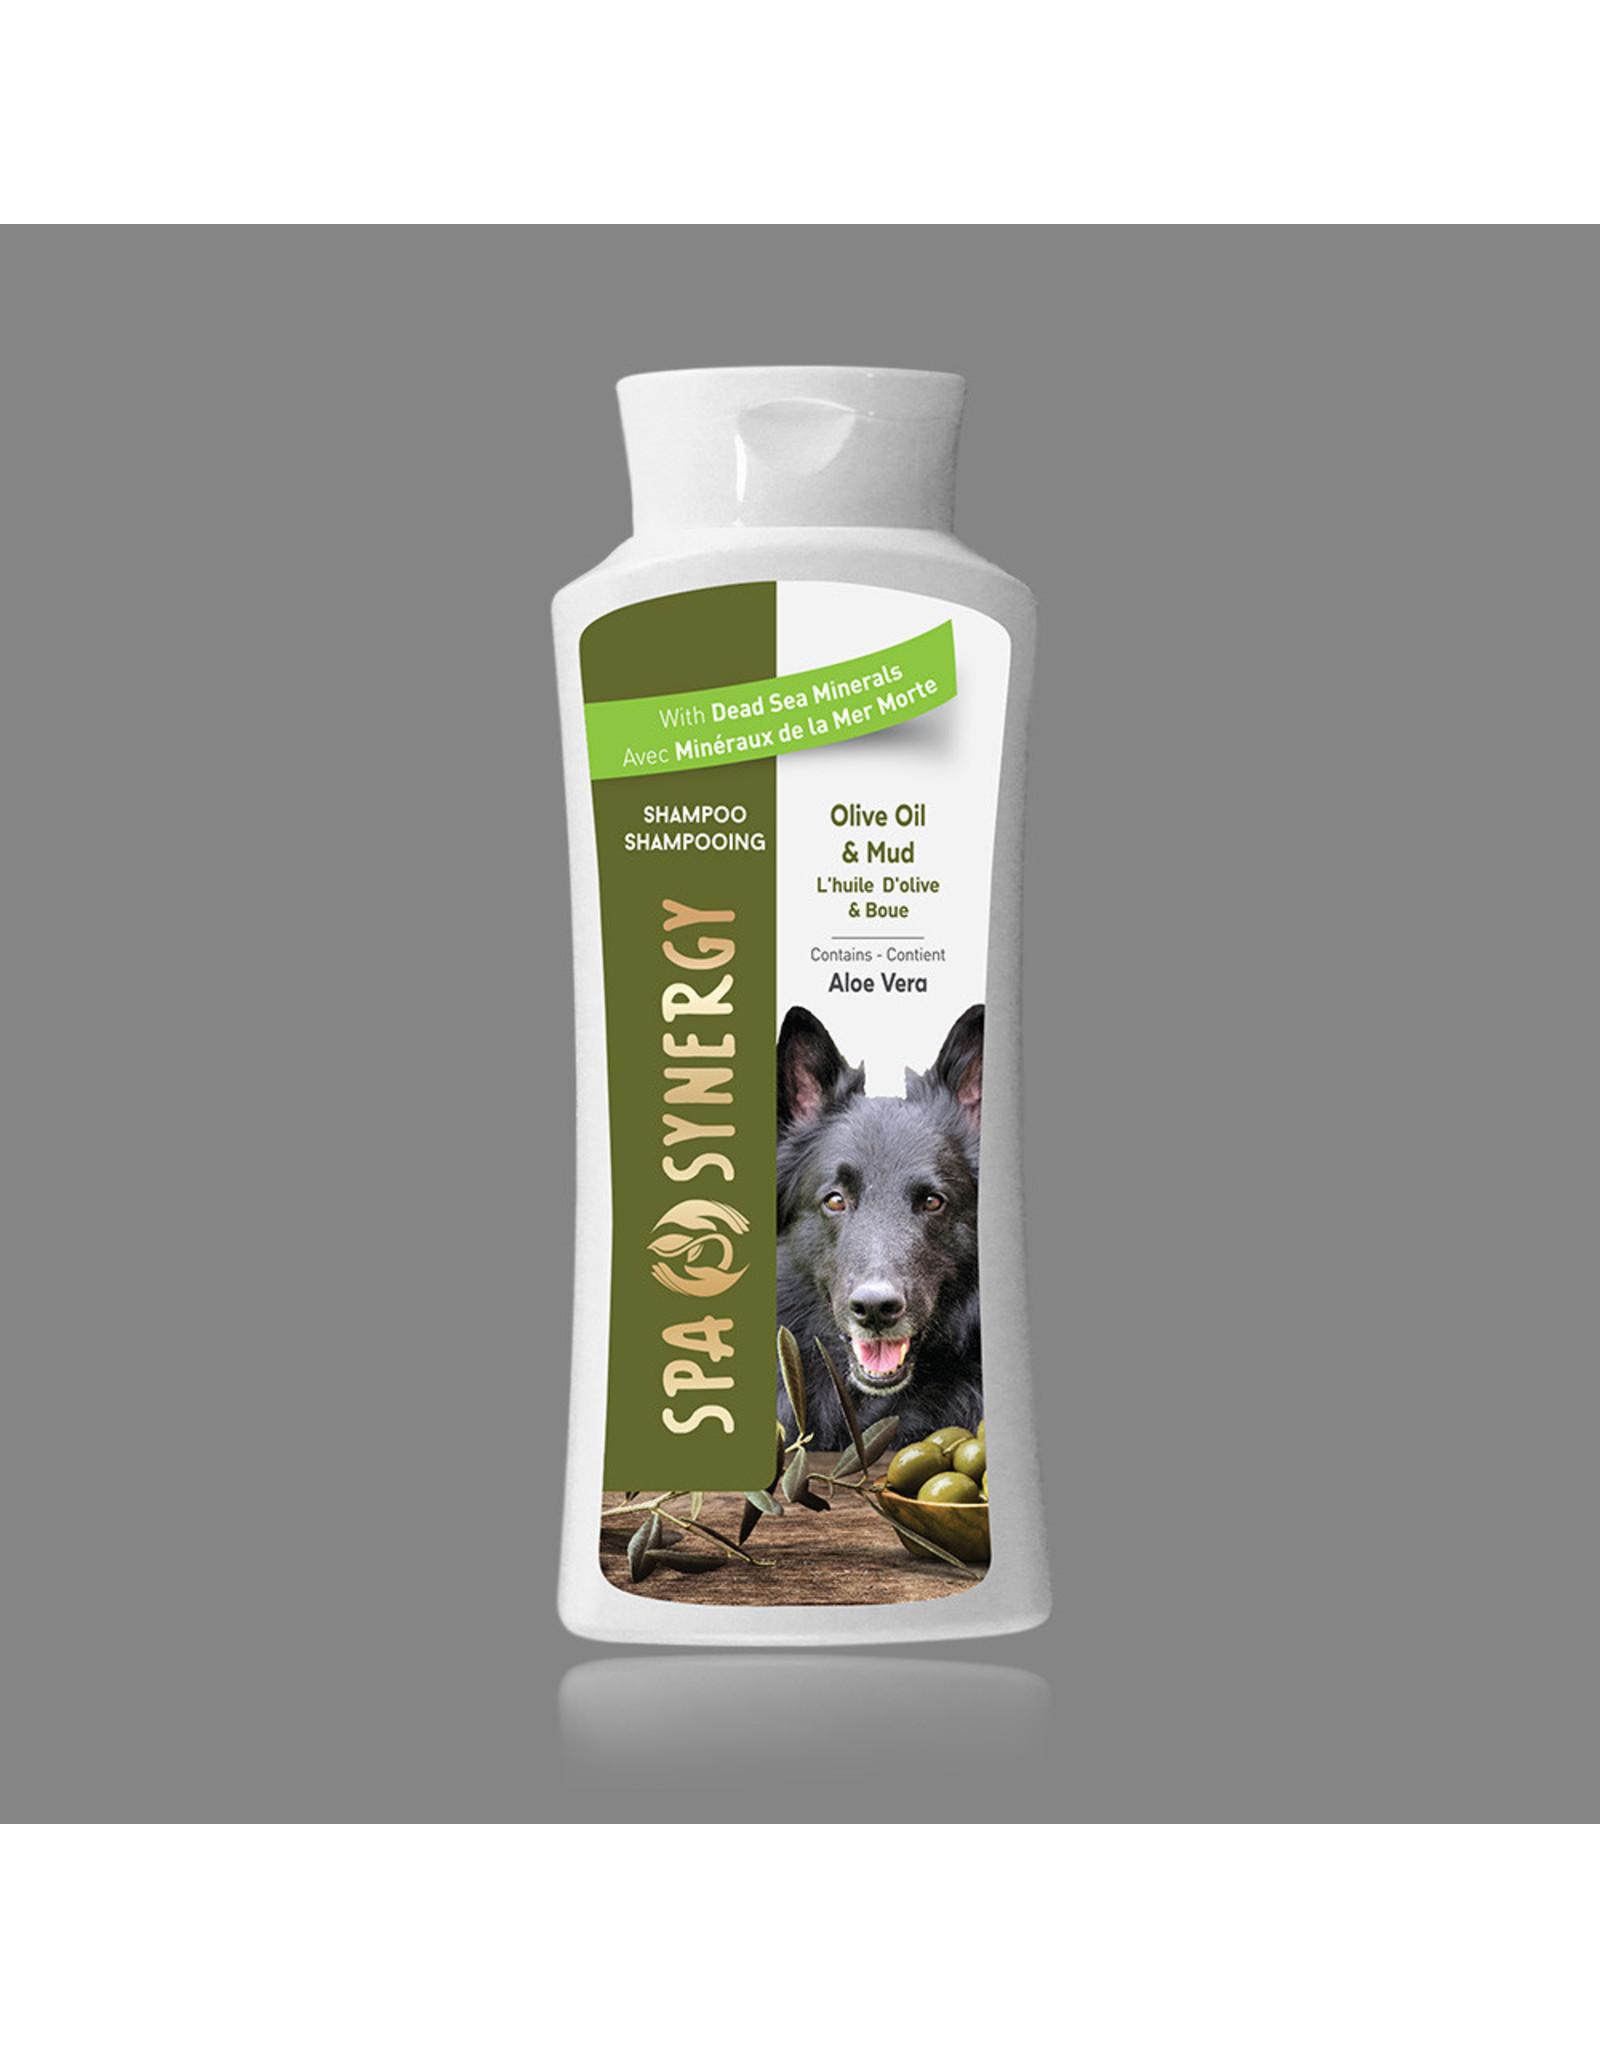 Spa Synergy Spa Synergy Olive Oil & Mud 500ml